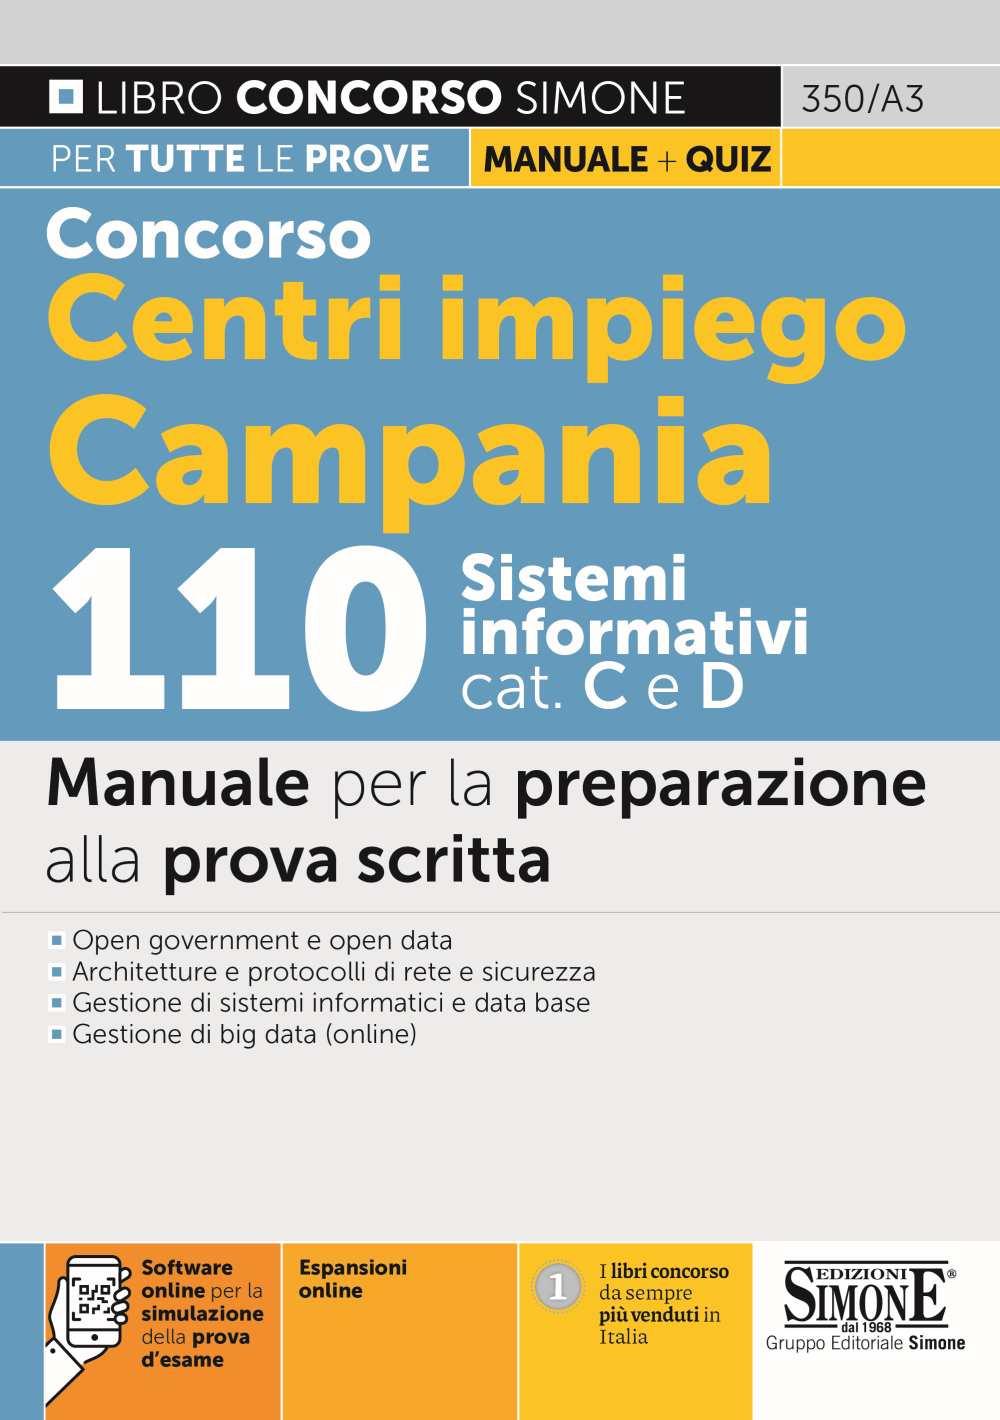 Concorso Centri impiego Campania